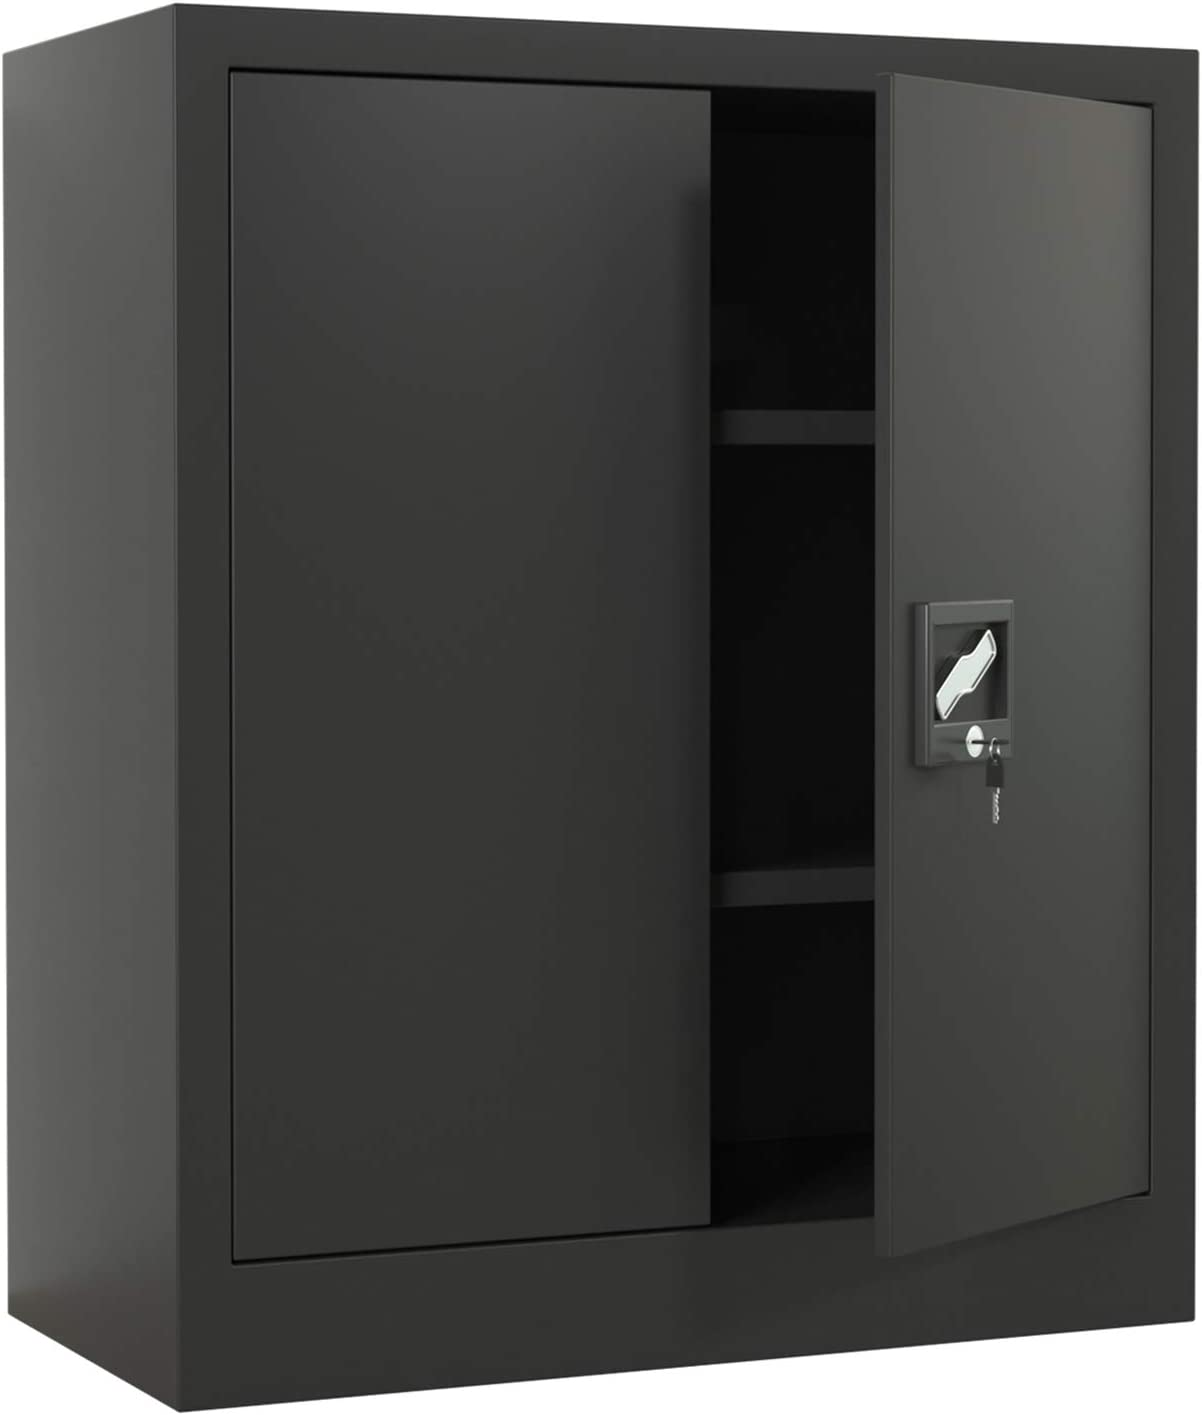 iJINGUR Metal Storage Cabinet with Locking Doors & 2 Height Adjustable Shelves, Lockable Steel File Cabinet, Great for Office, Garage and Kitchen Pantry (Black)